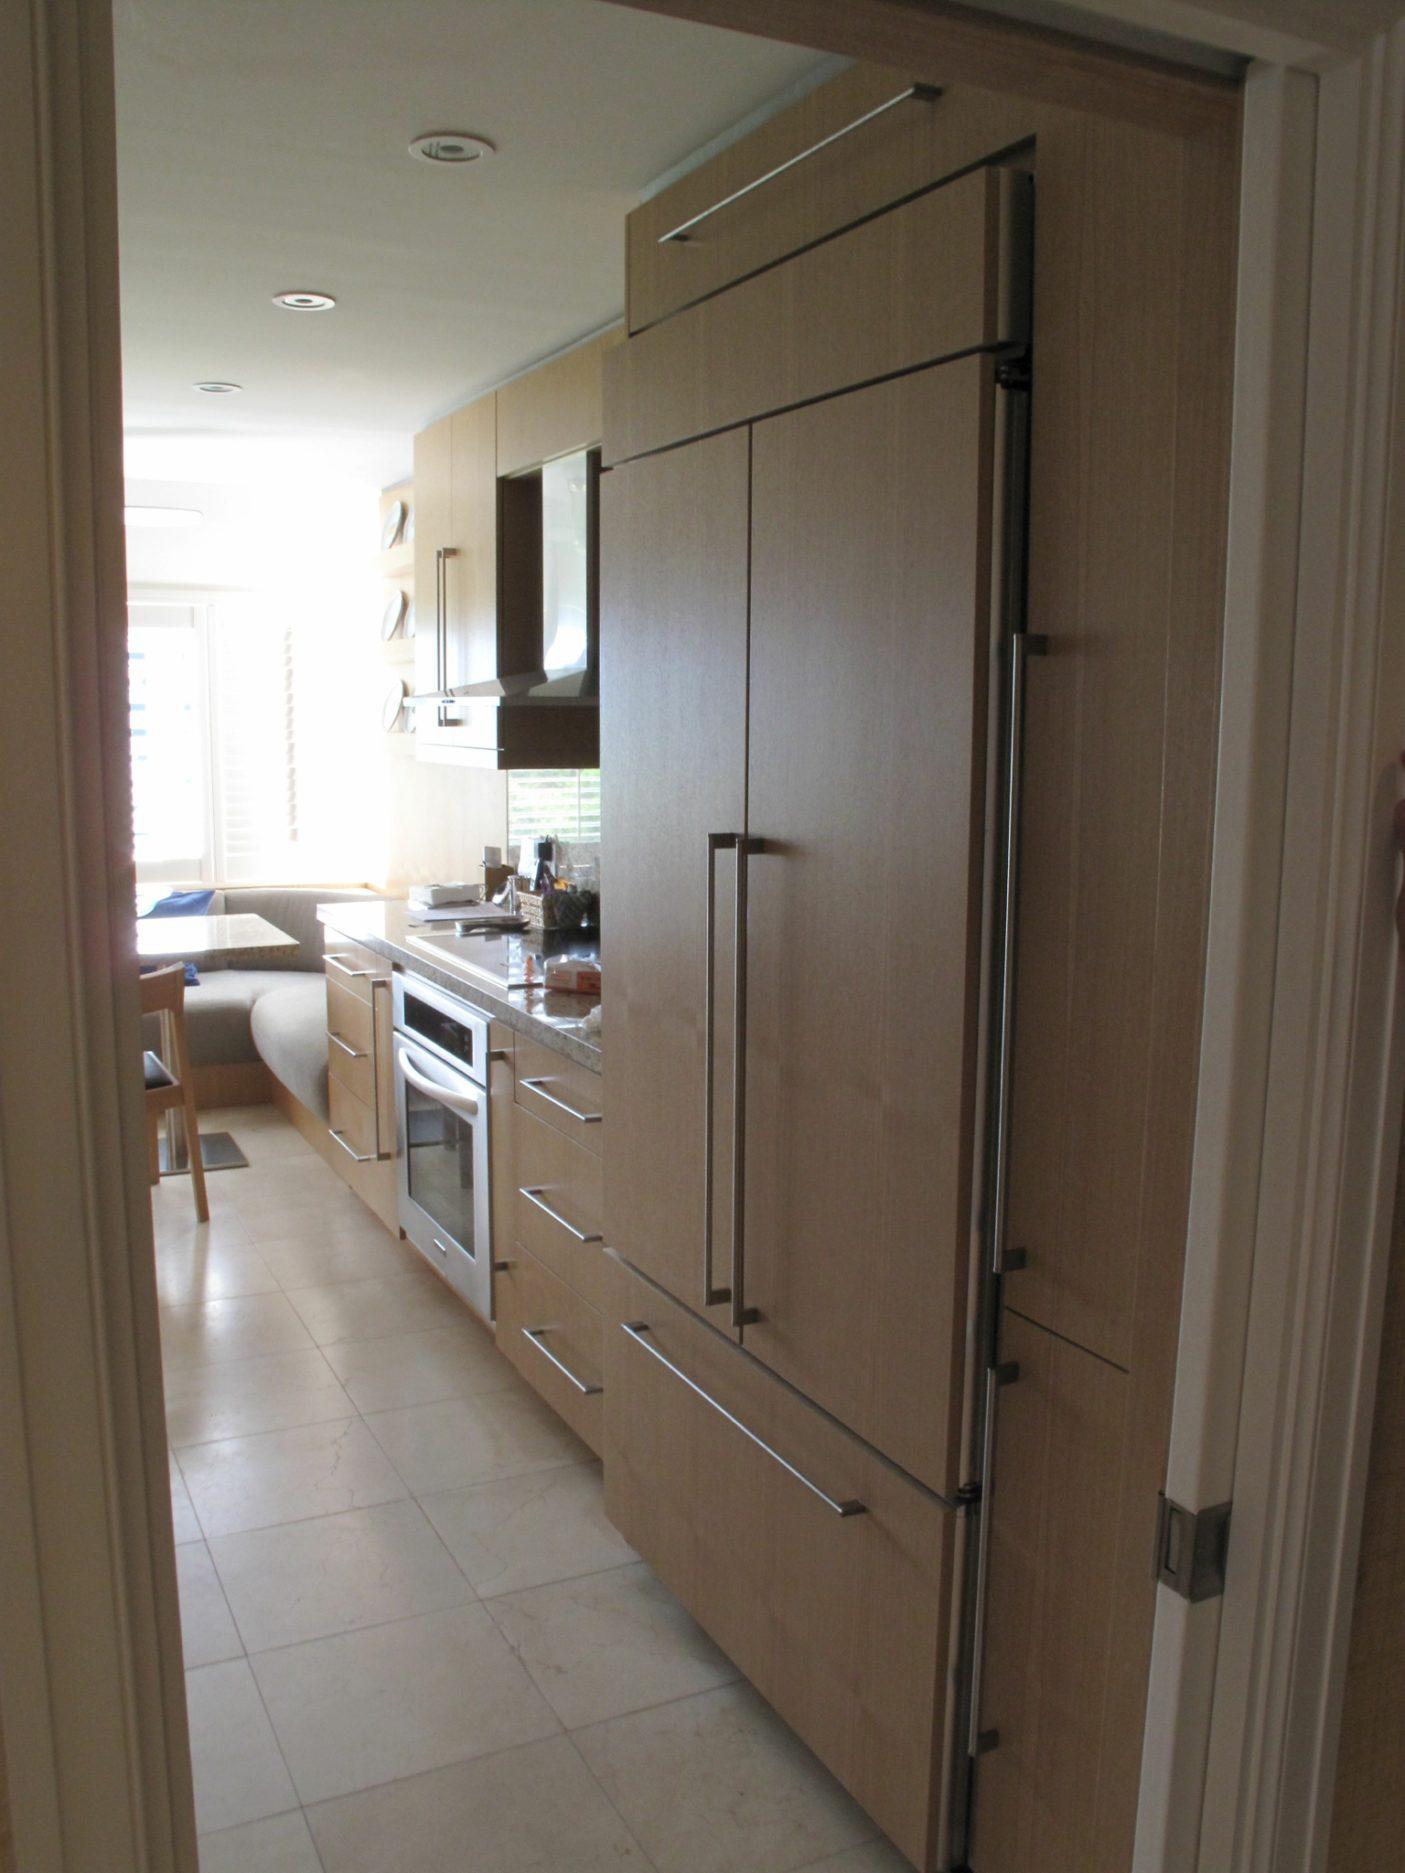 Kitchens-135.jpg